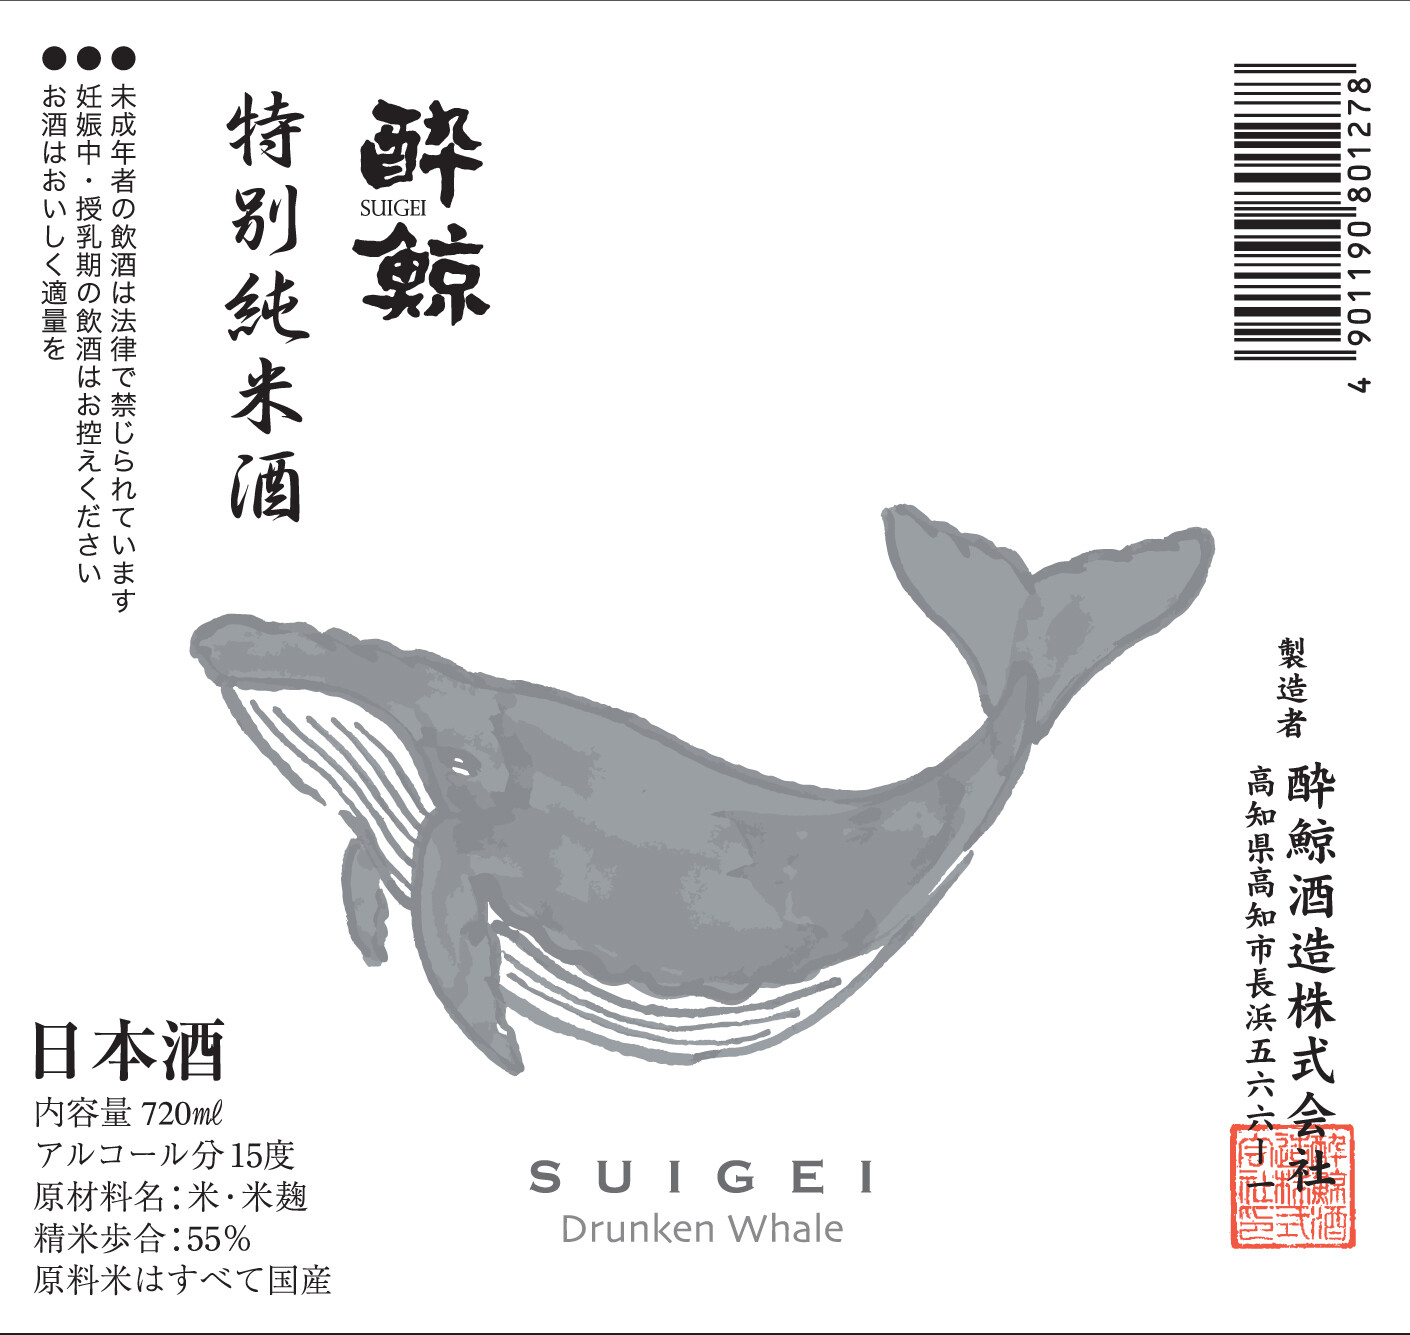 Suigei Drunken Whale Tokubetsu Junmai Sake 720ml